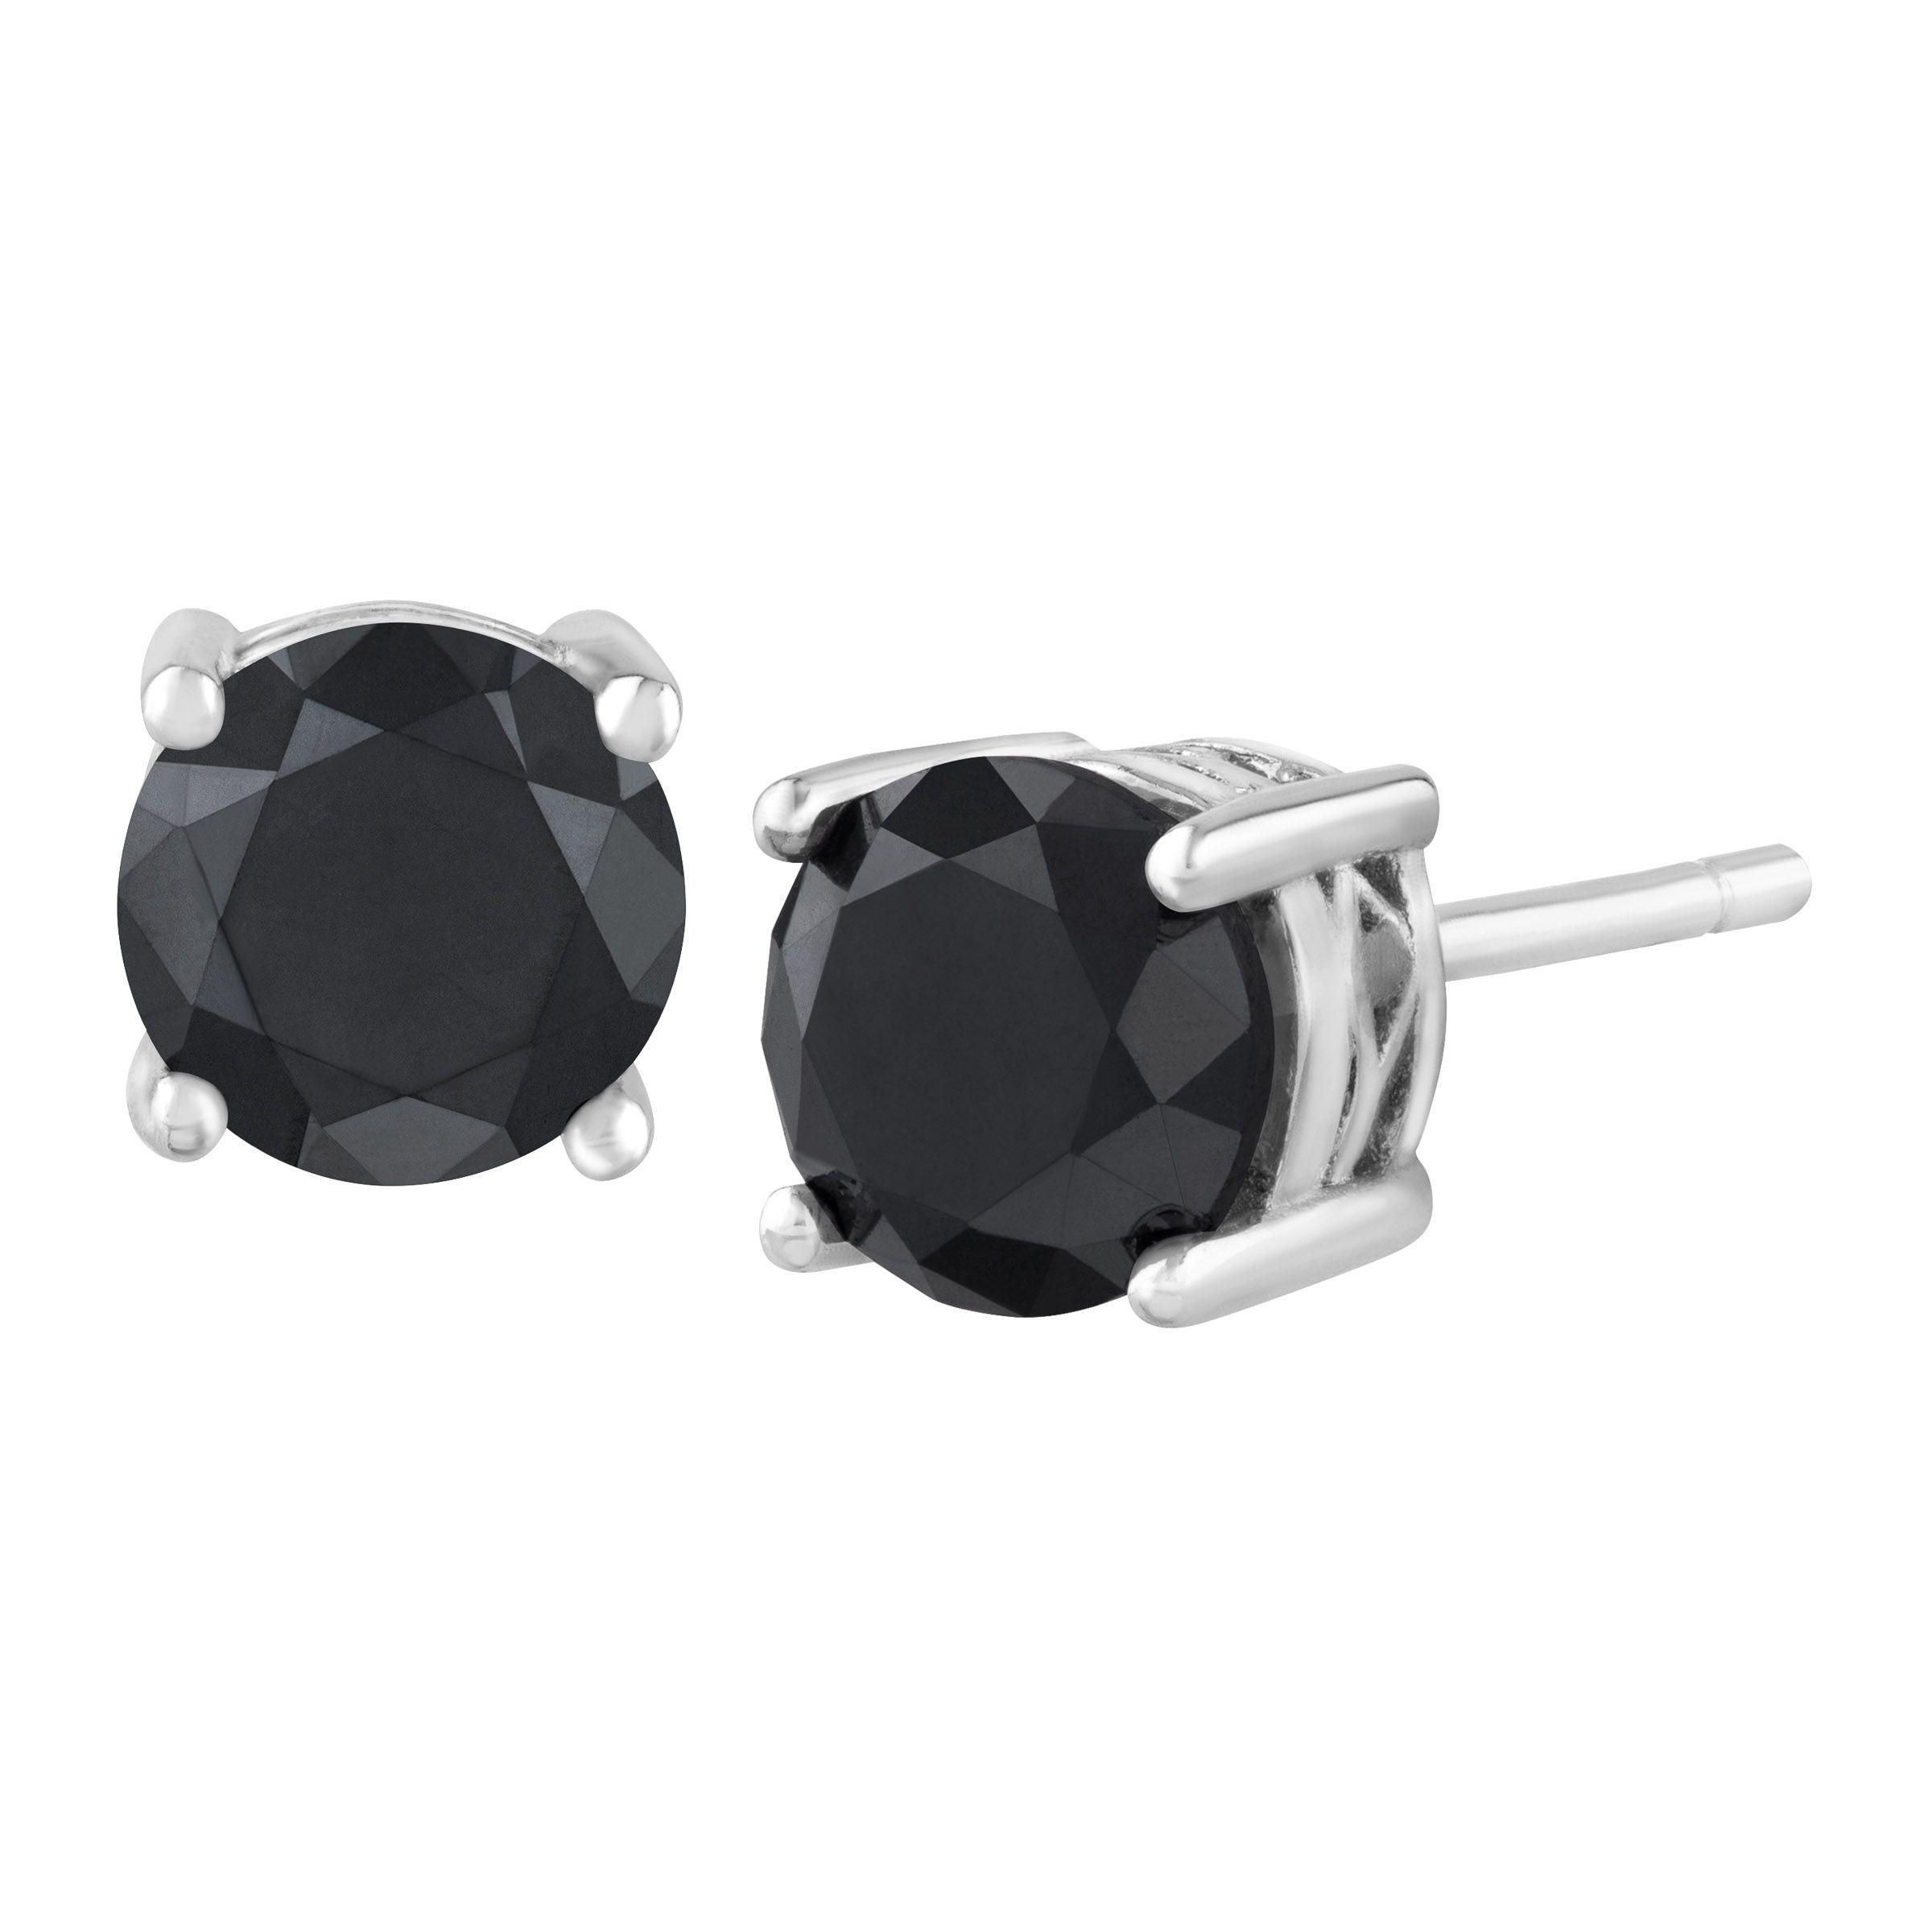 1 2 Ct Black Diamond Stud Earrings In Sterling Silver